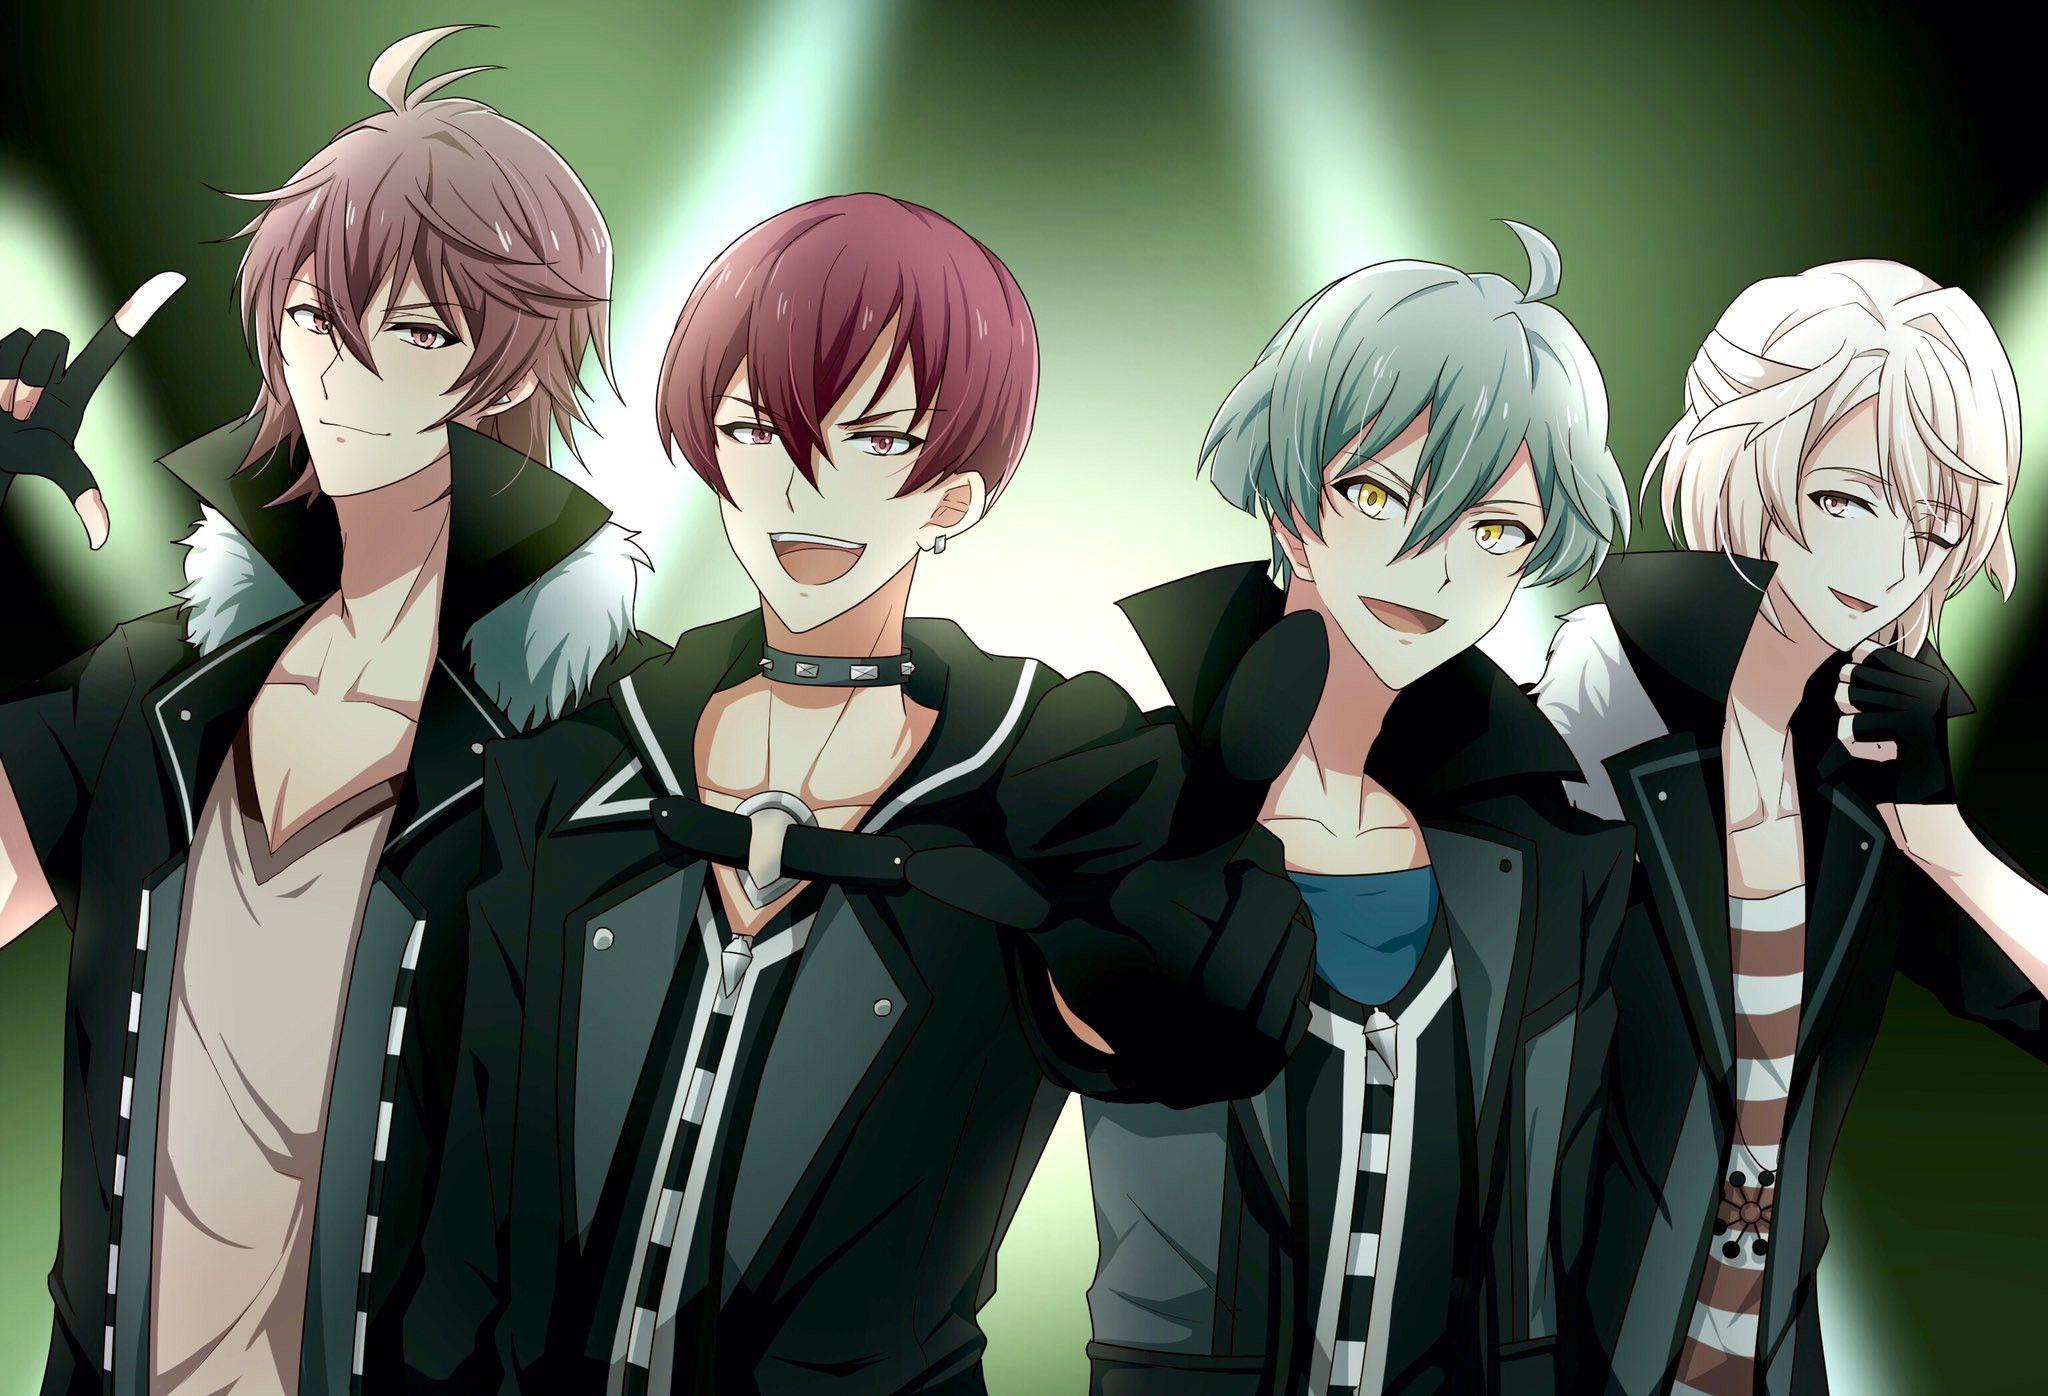 Twitter Mifa_inana Rhythm games, Slice of life, Anime